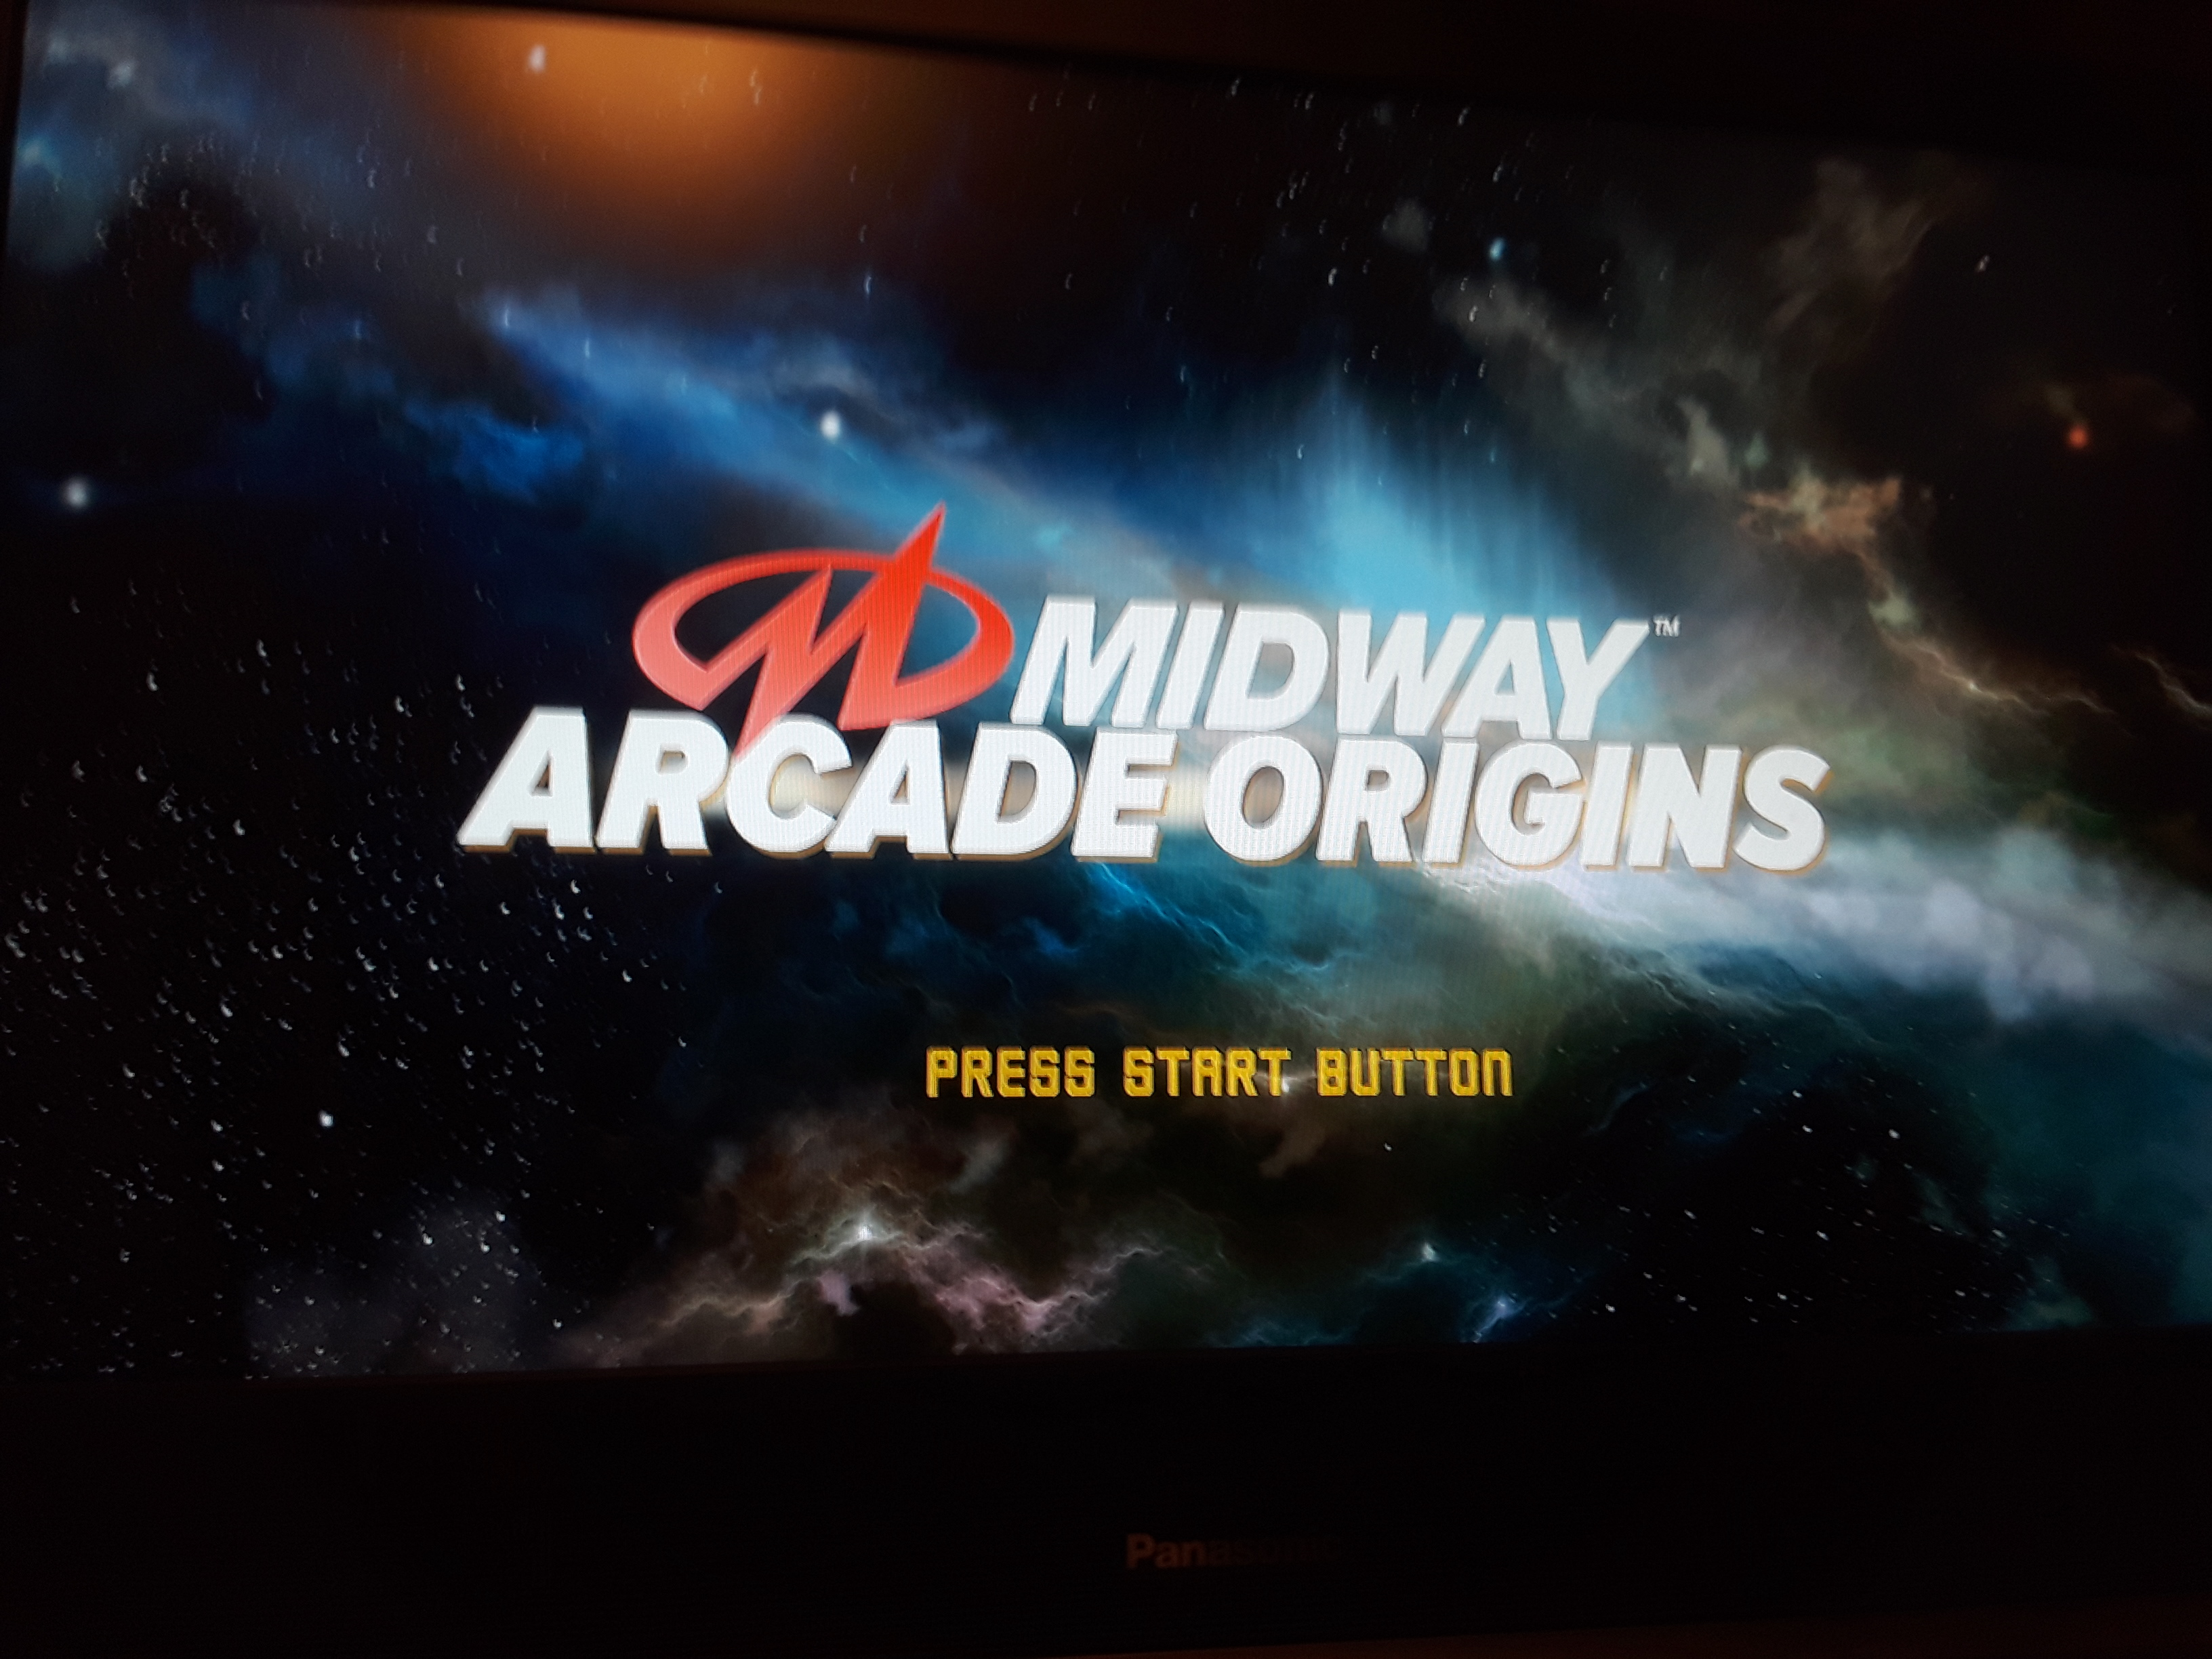 JML101582: Midway Arcade Origins: Gauntlet 2 [Hard] (Playstation 3) 2,400 points on 2018-09-19 23:04:35